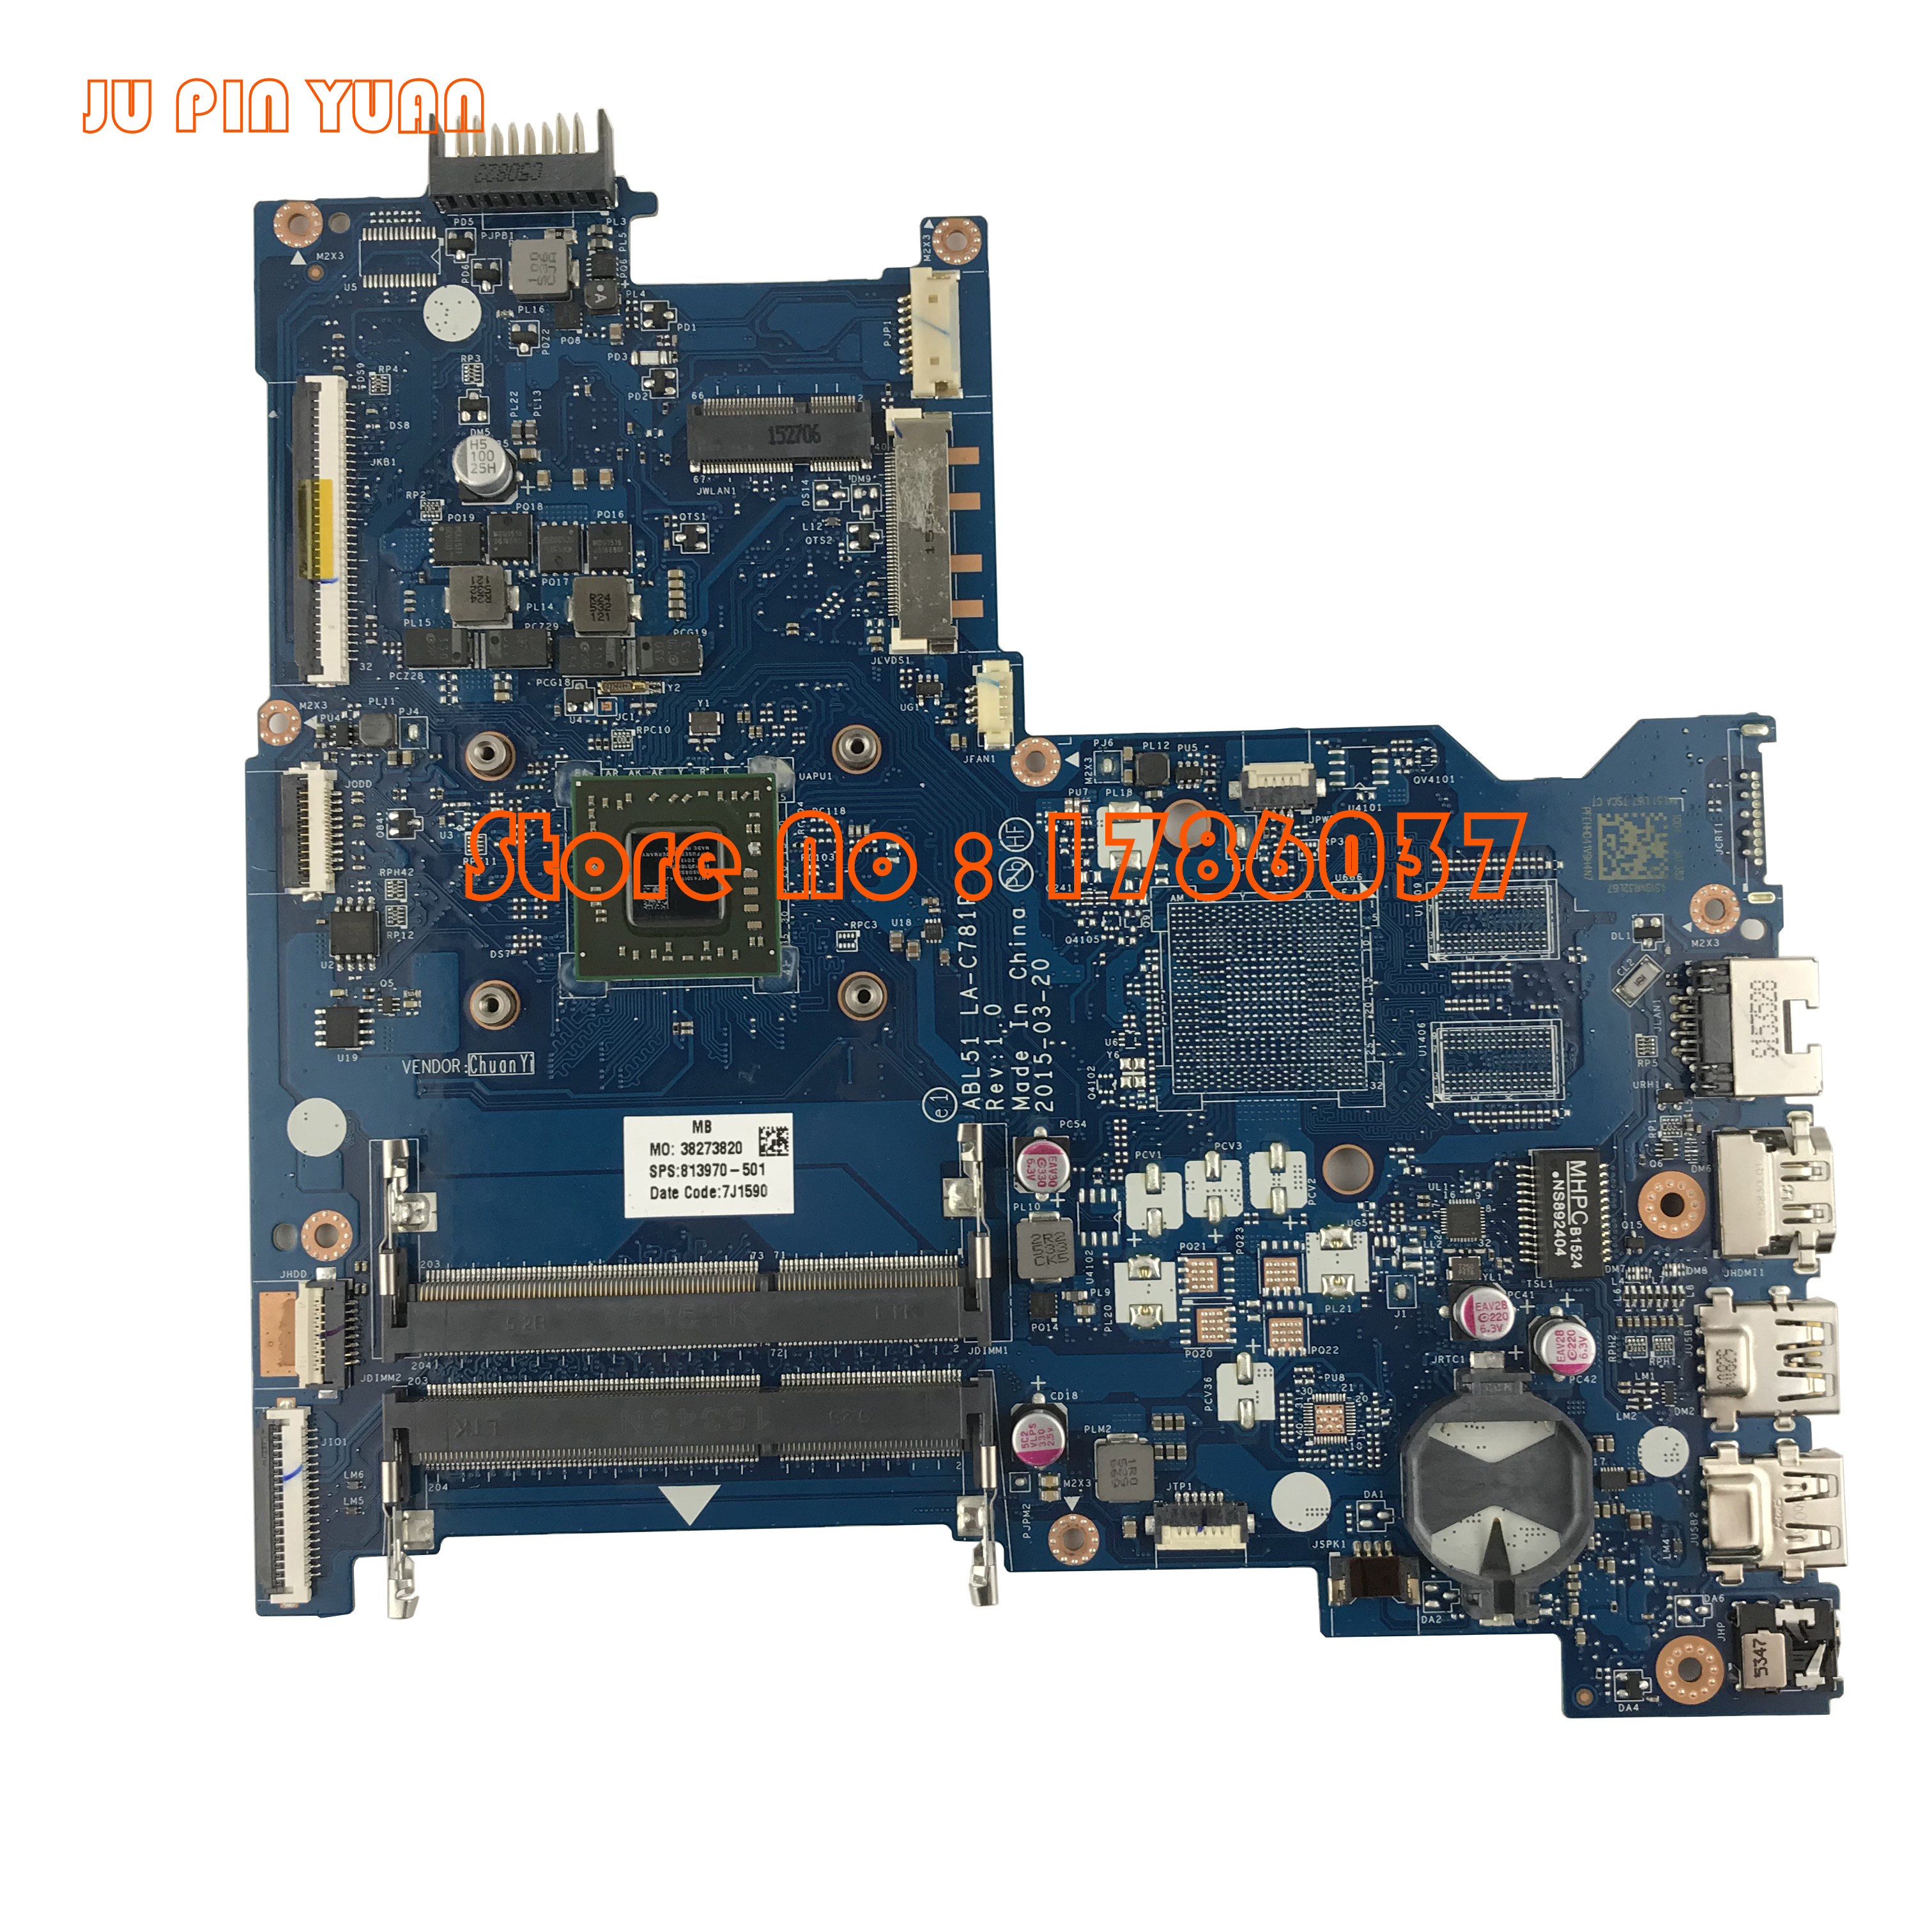 JU PIN YUAN 813970-001 813970-501 ABL51 LA-C781P Für HP Notebook 15Z-AF Serie Motherboard A8-7410 Alle Funktionen Vollständig Getestet